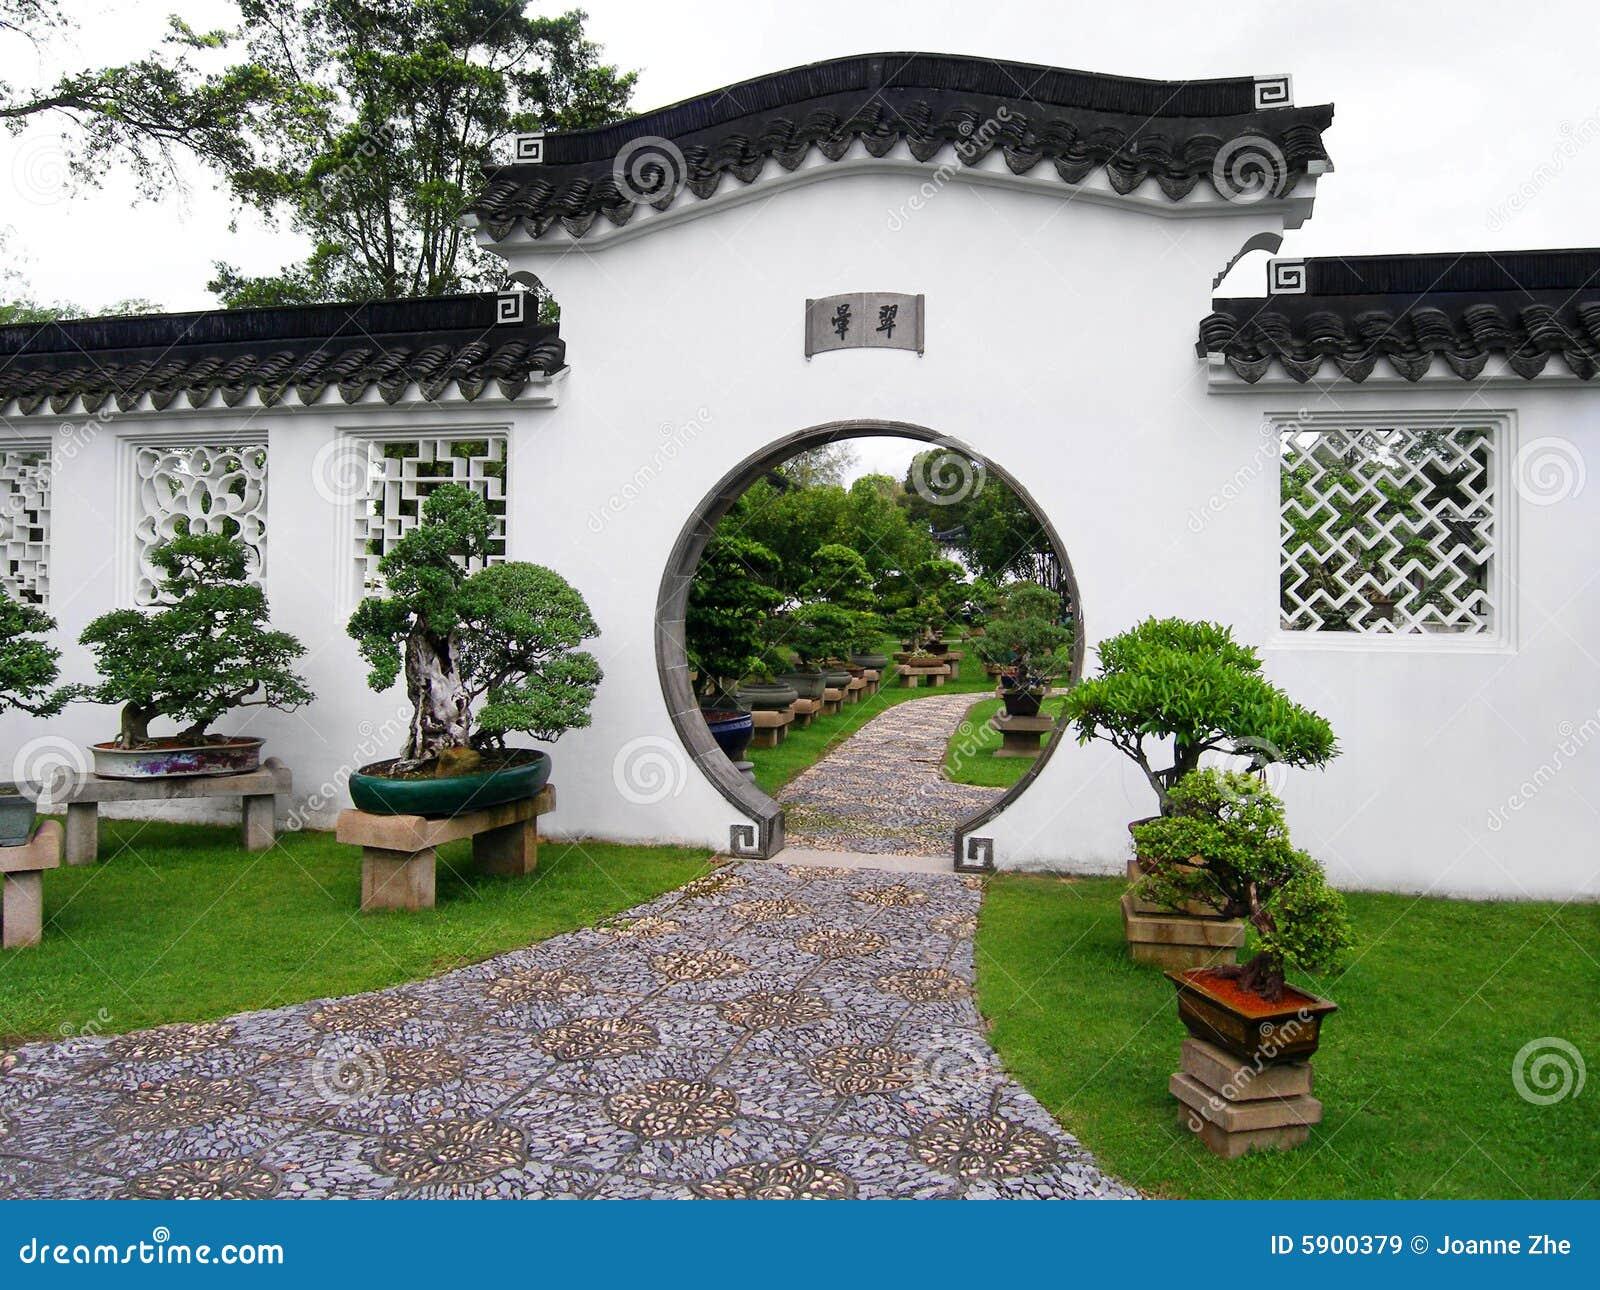 Jardín y bonsais chinos